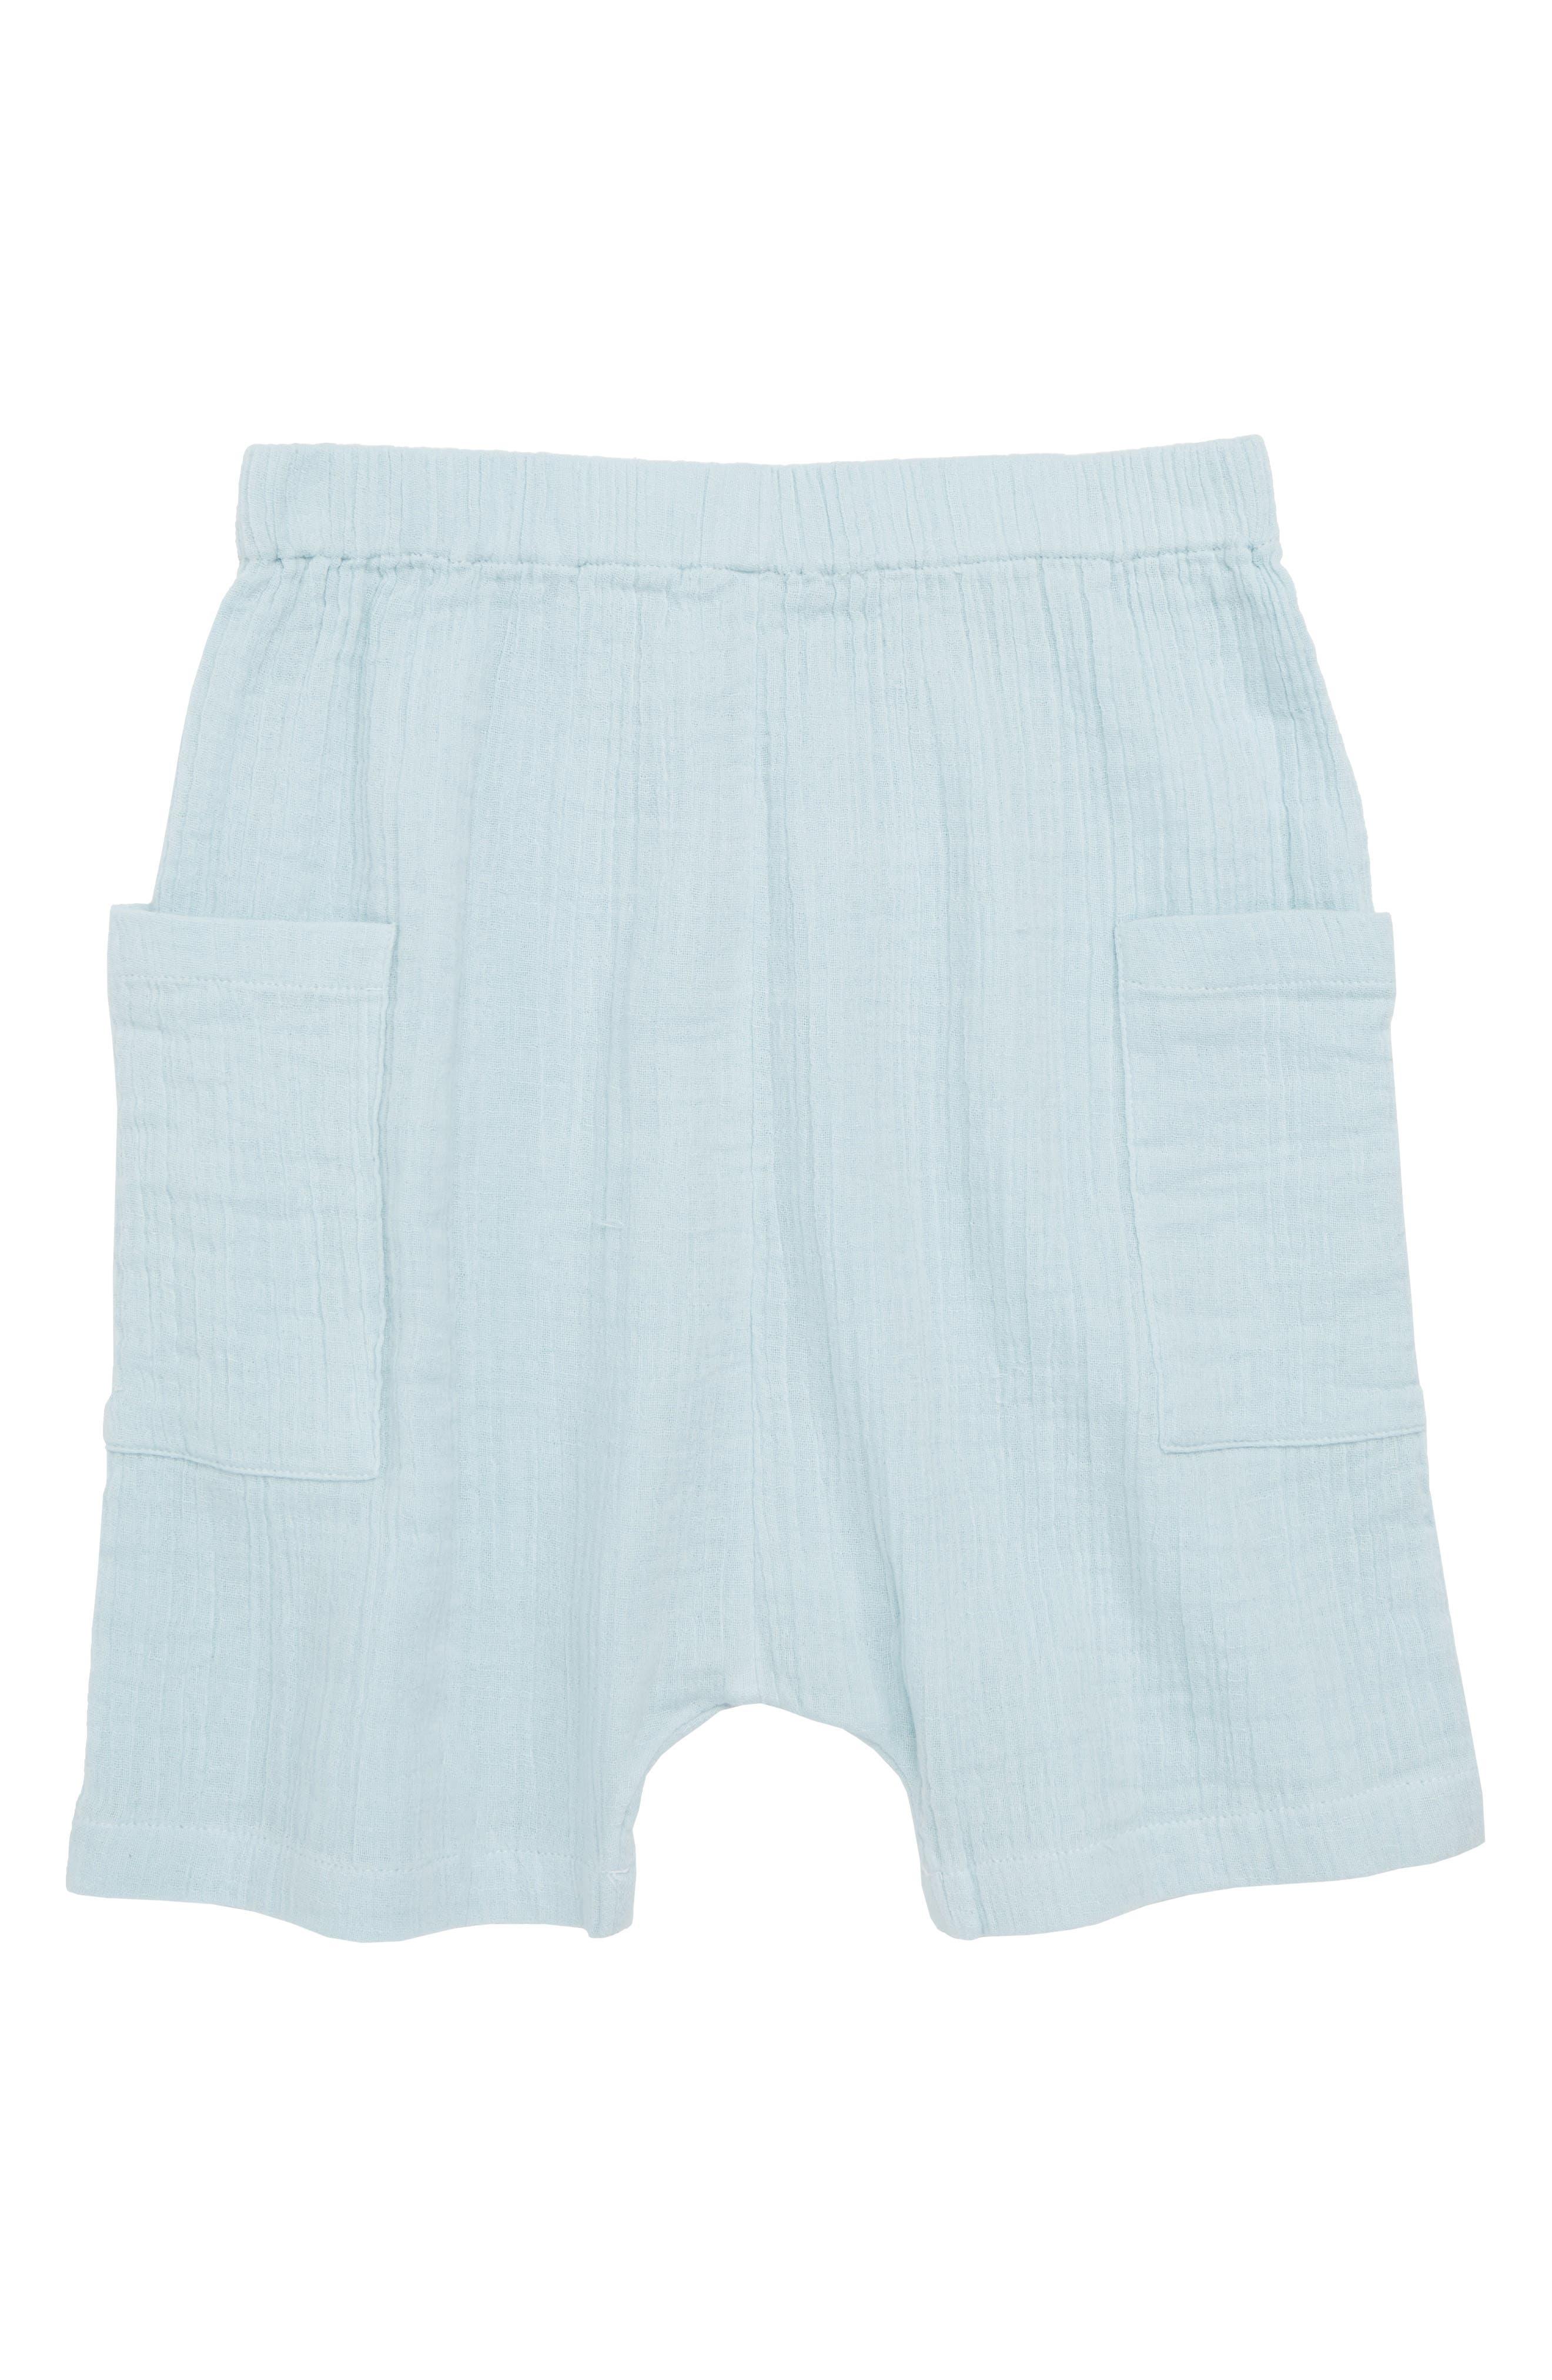 Crepe Moon Shorts,                             Main thumbnail 1, color,                             Blue Sterling